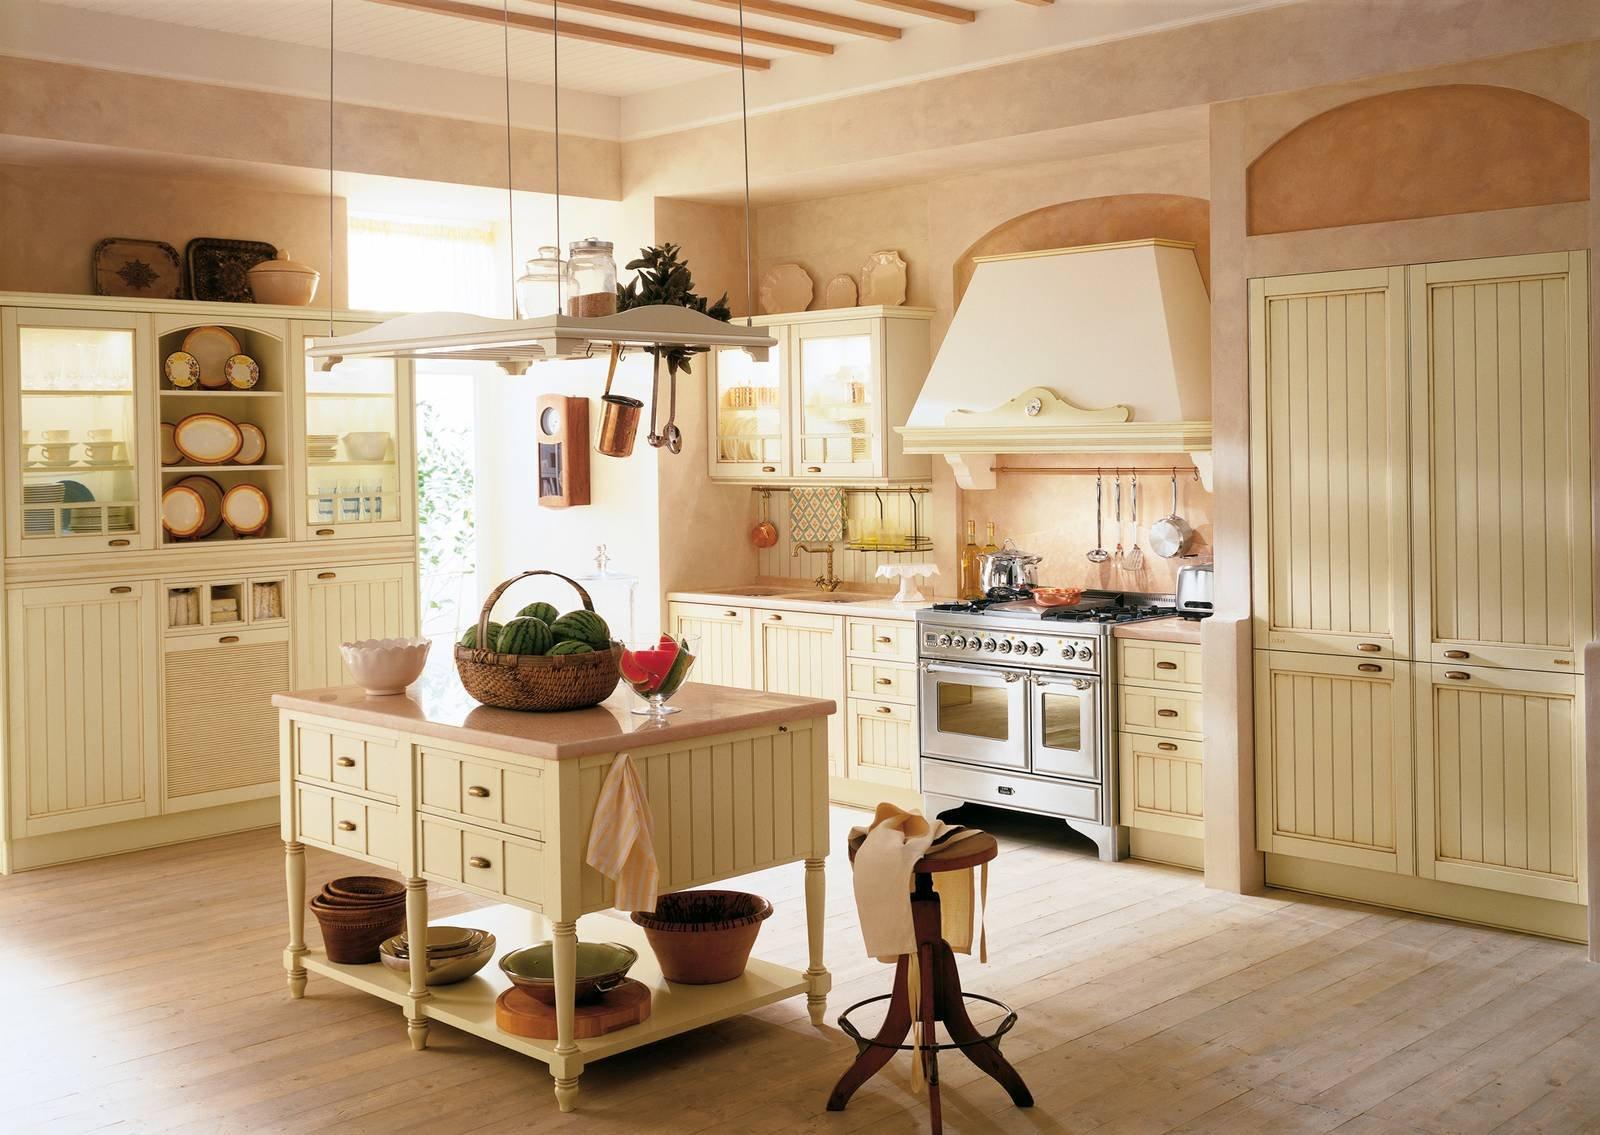 Cucina in stile country anche in versione attuale cose di casa - Cucine country immagini ...